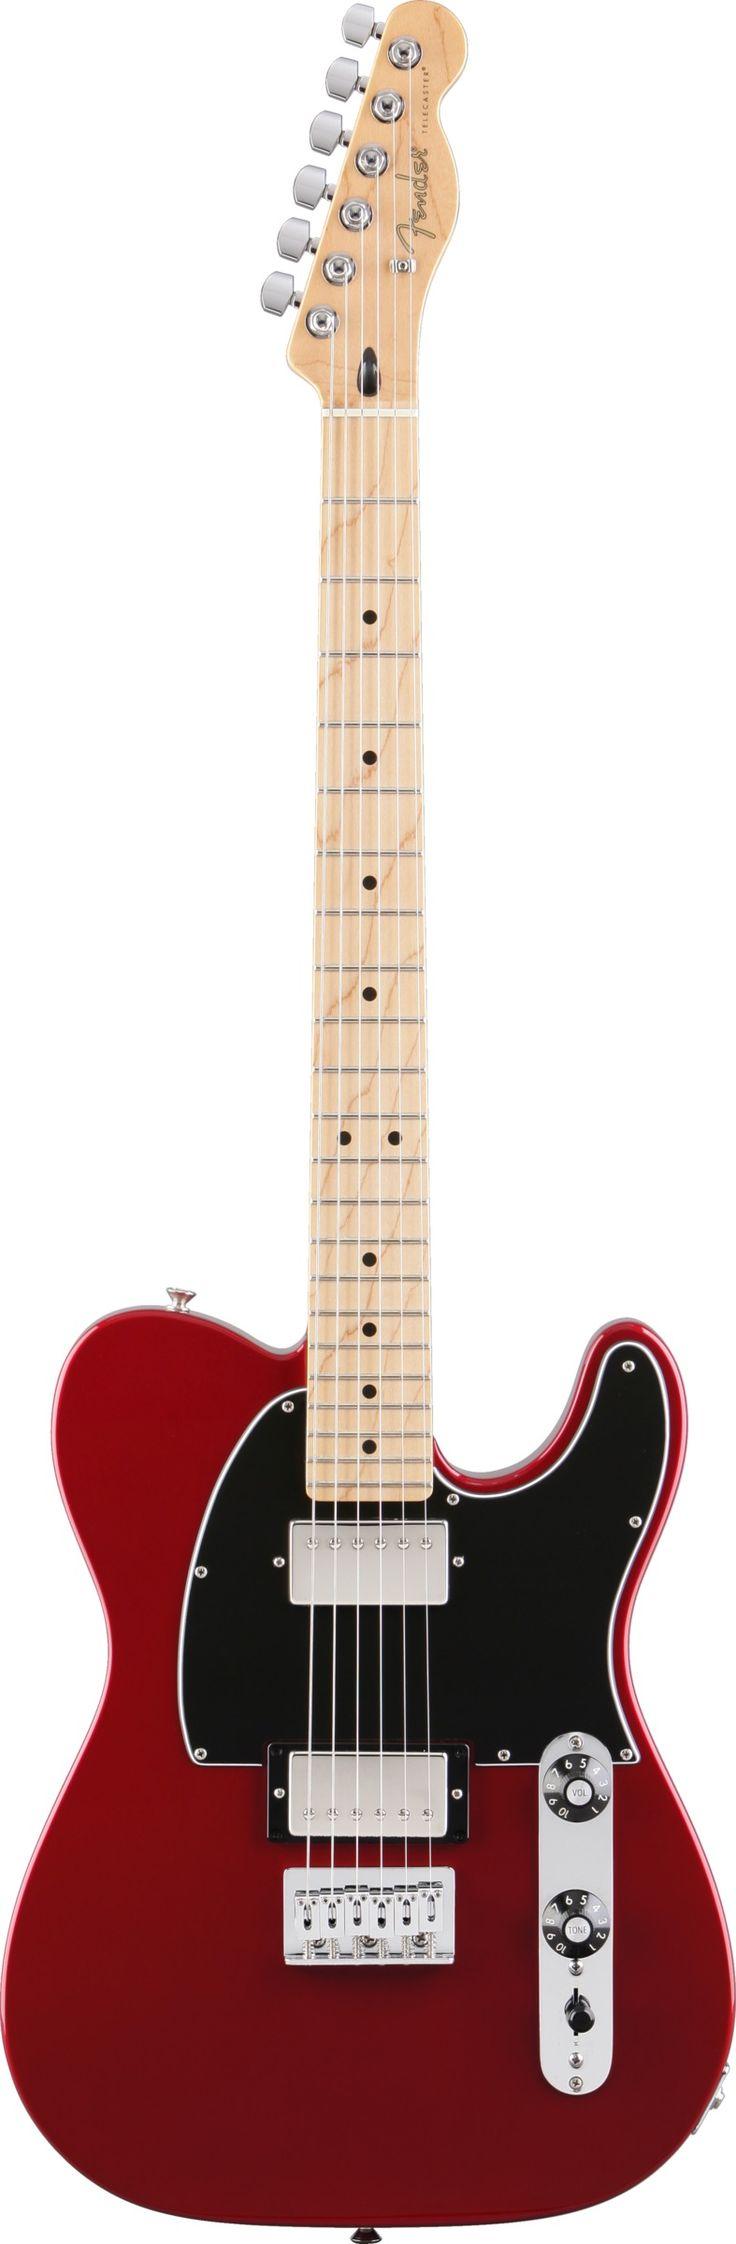 Fender Blacktop™ Telecaster HH